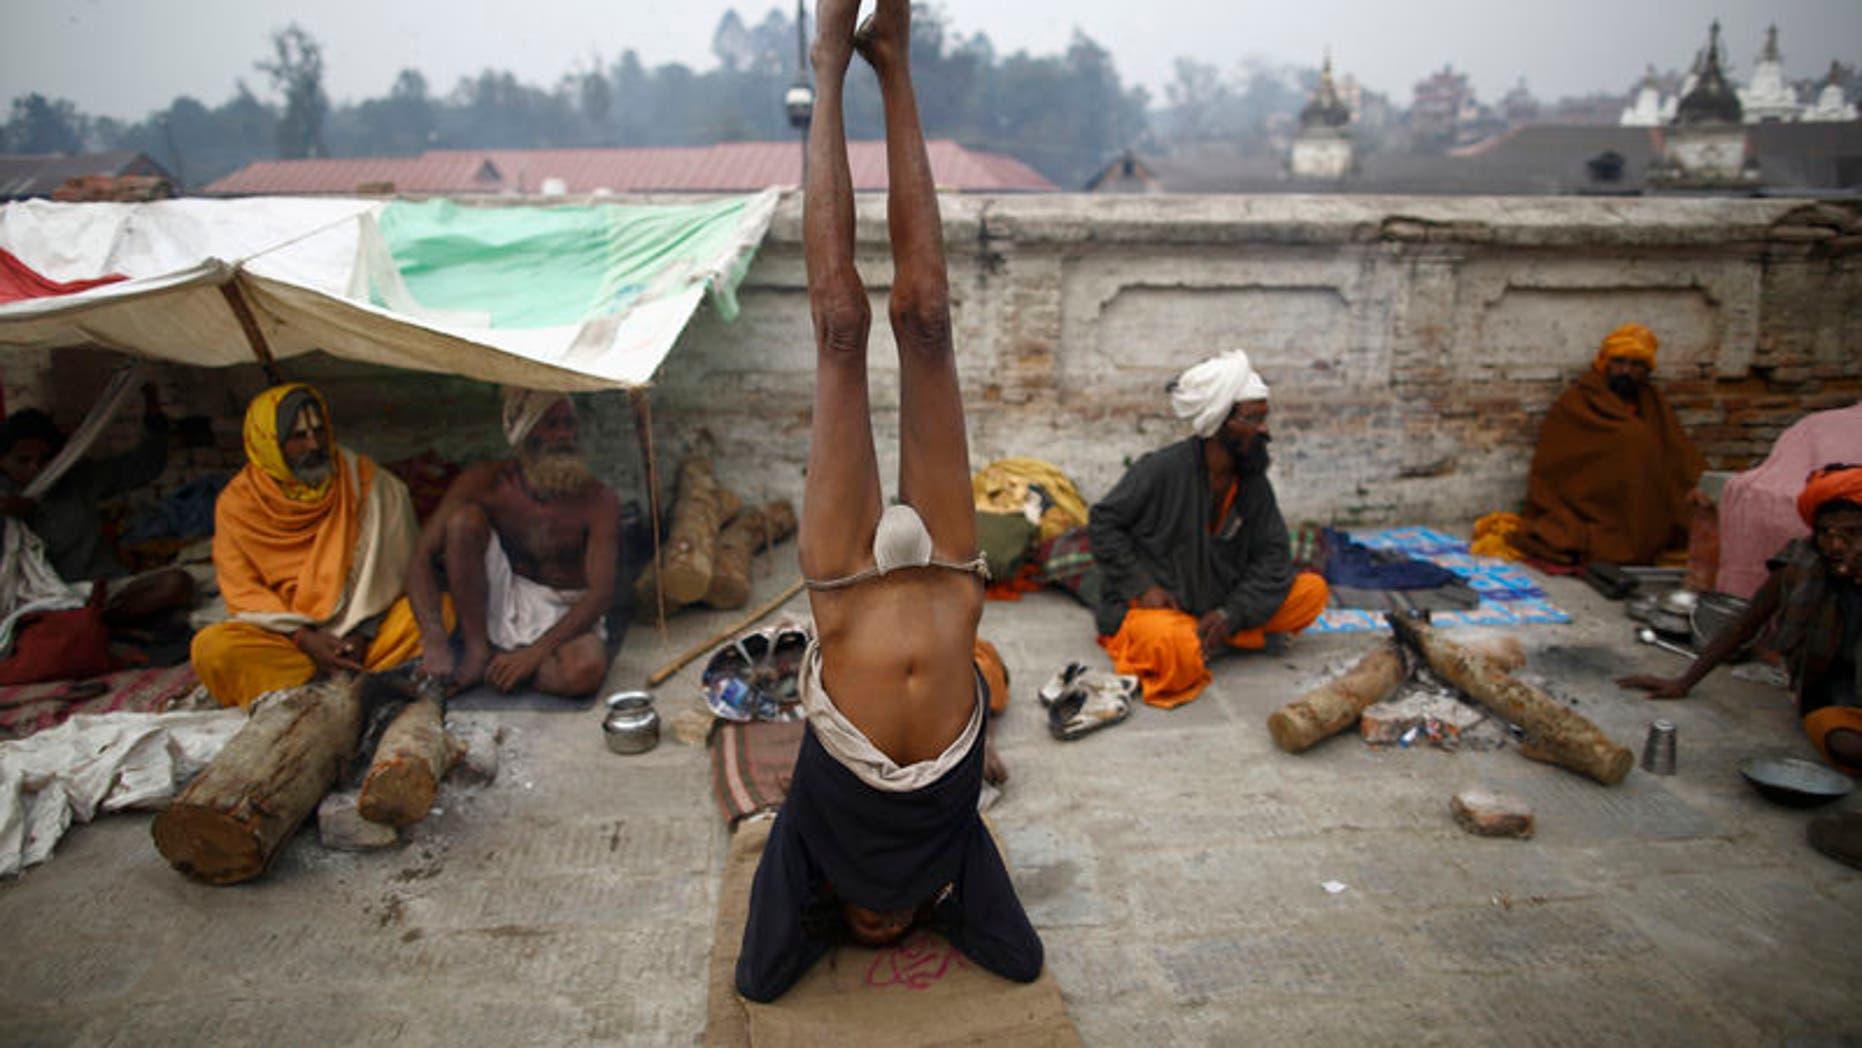 A Hindu holy man, or sadhu, performs yoga at the premises of Pashupatinath Temple in Kathmandu February 26, 2014. REUTERS/Navesh Chitrakar